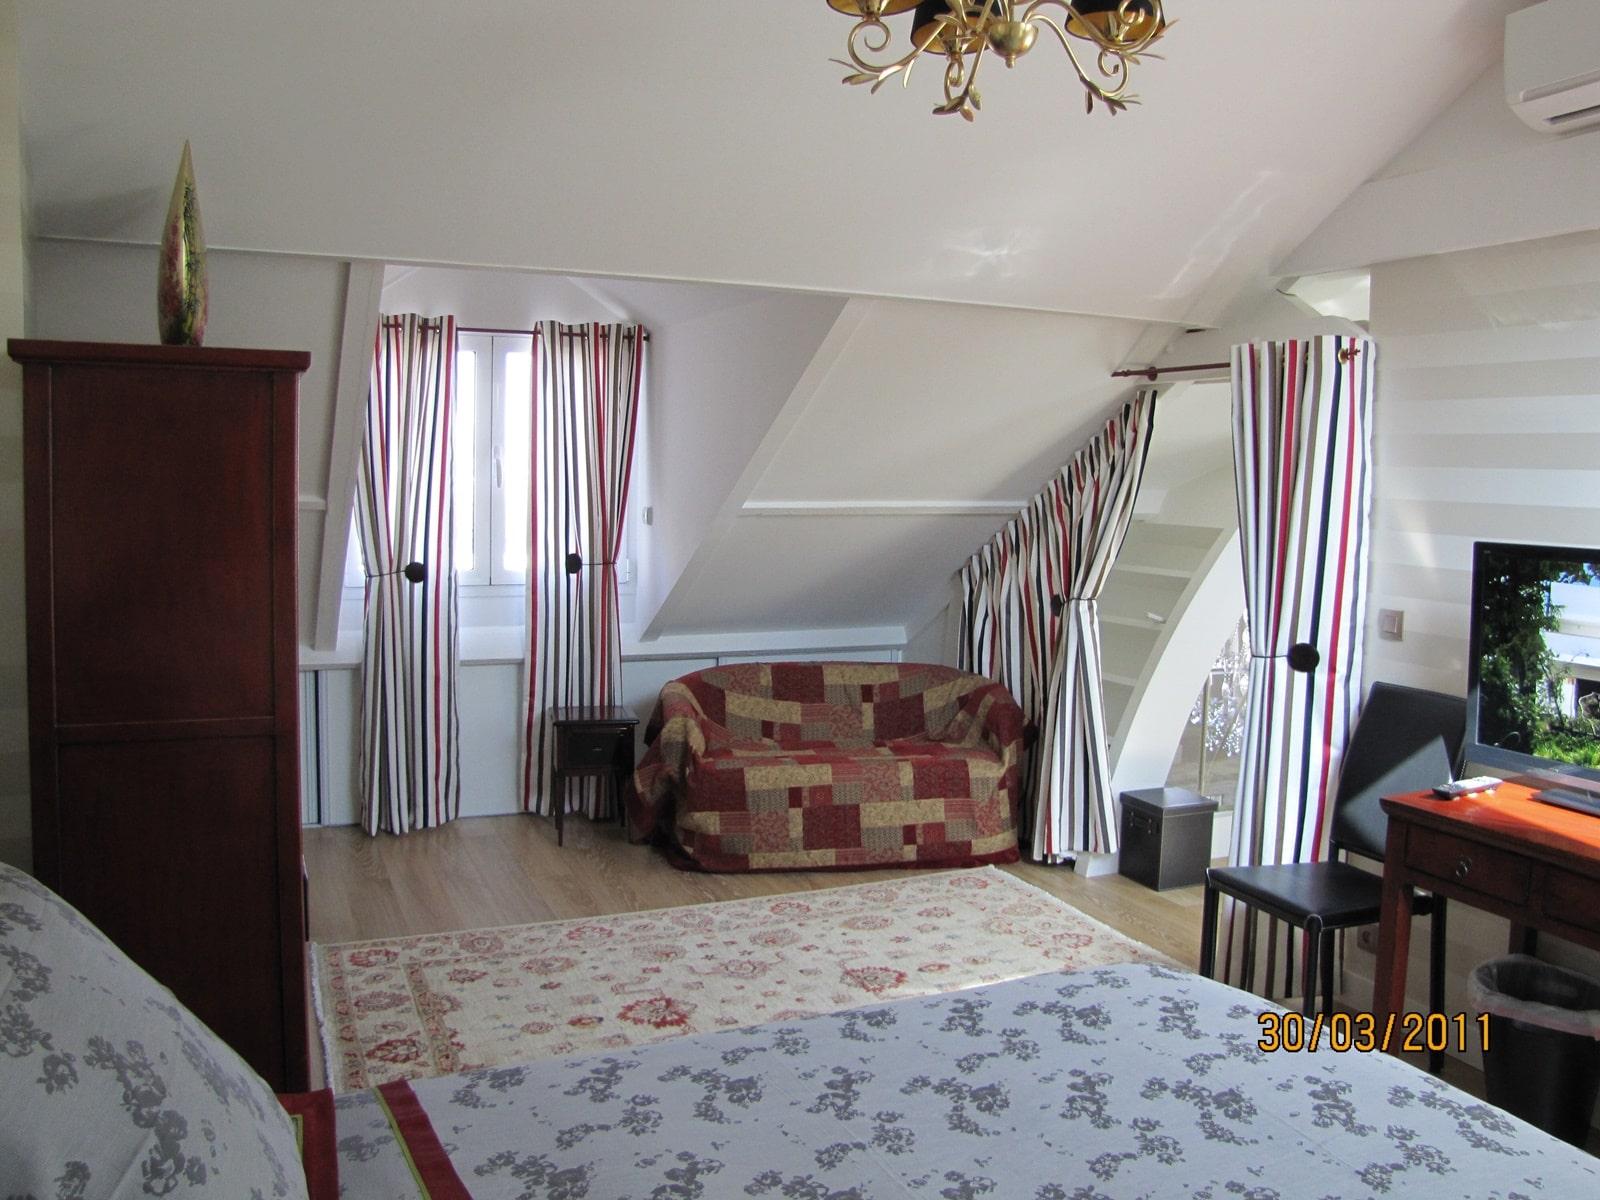 Chez-Marile-1